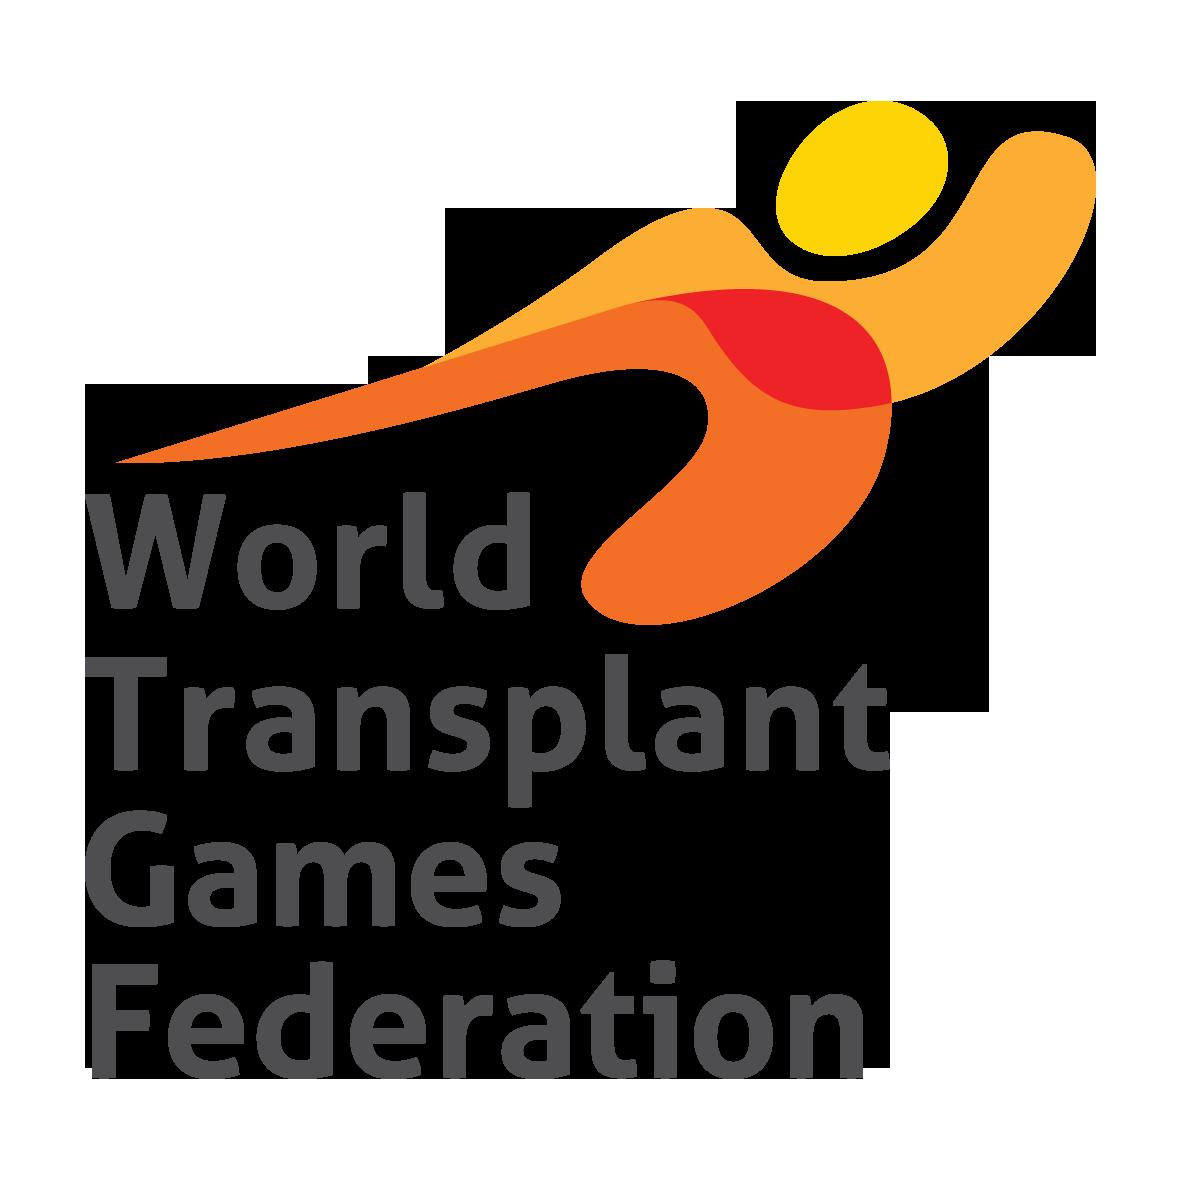 WORLD TRANSPLANT GAMES FEDERATION